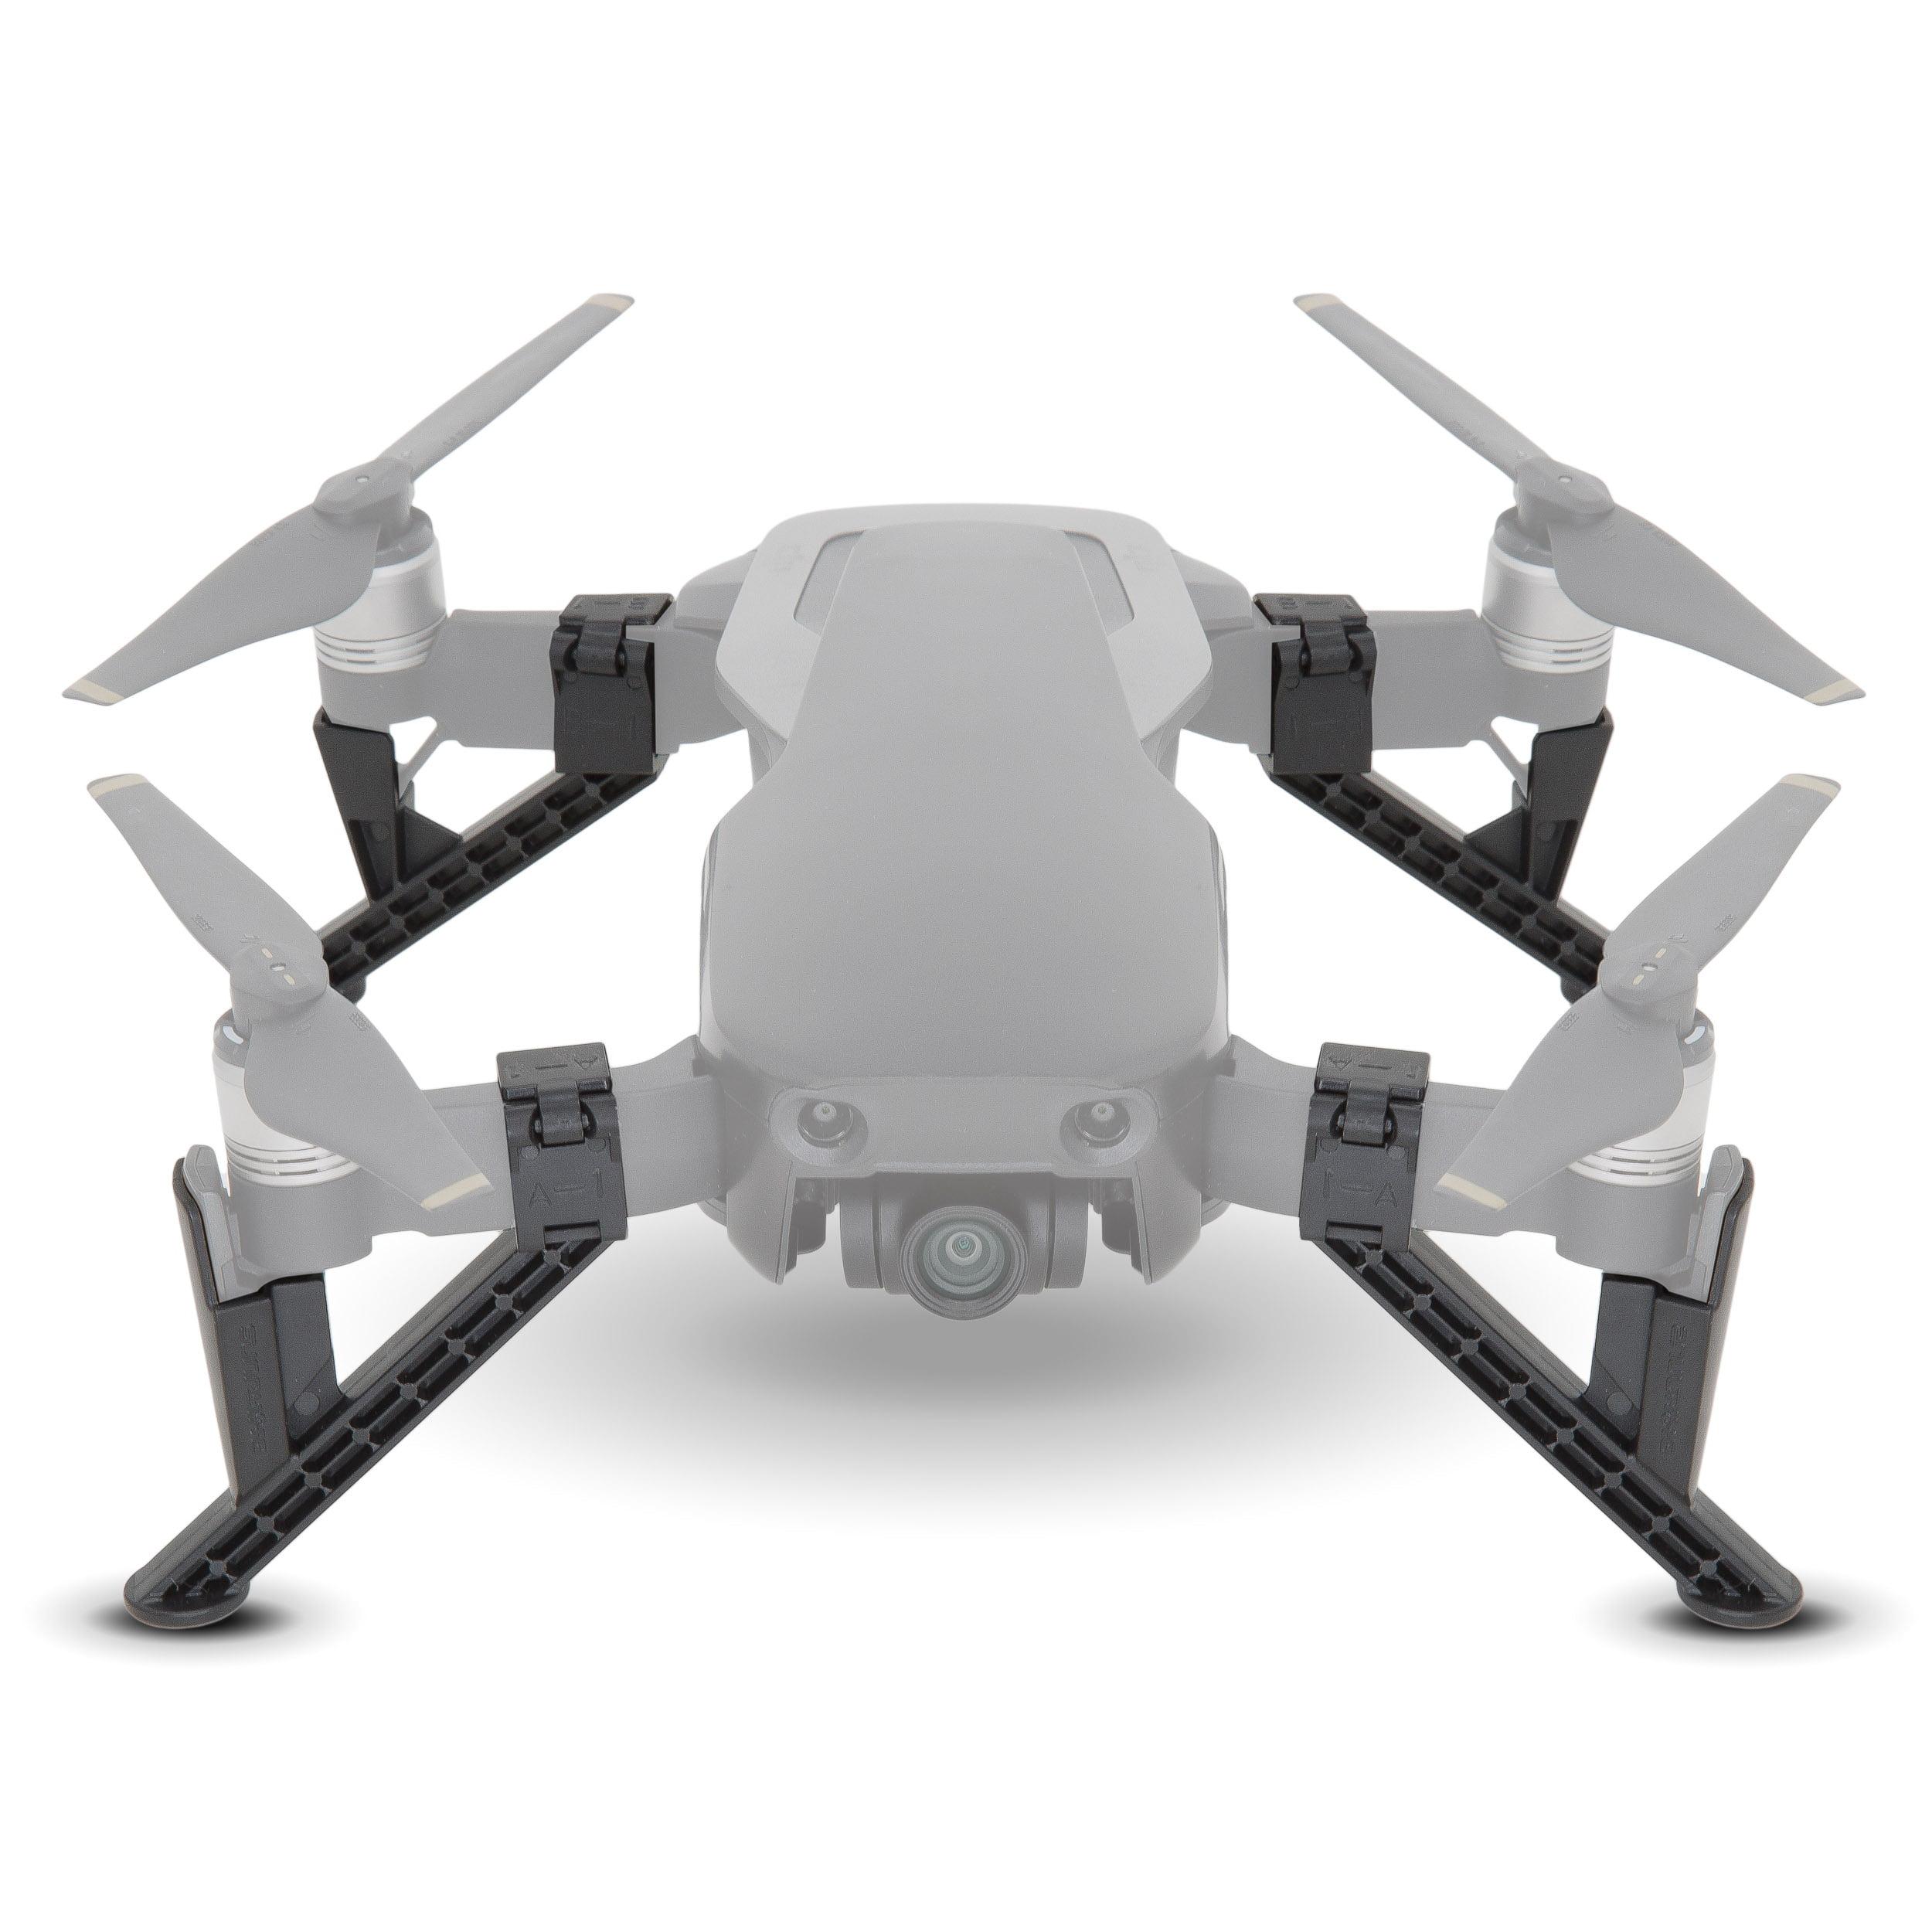 Shaluoman 2 in 1 Propeller Guard with Landing Gear for Mavic Mini Drone Accessories Grey